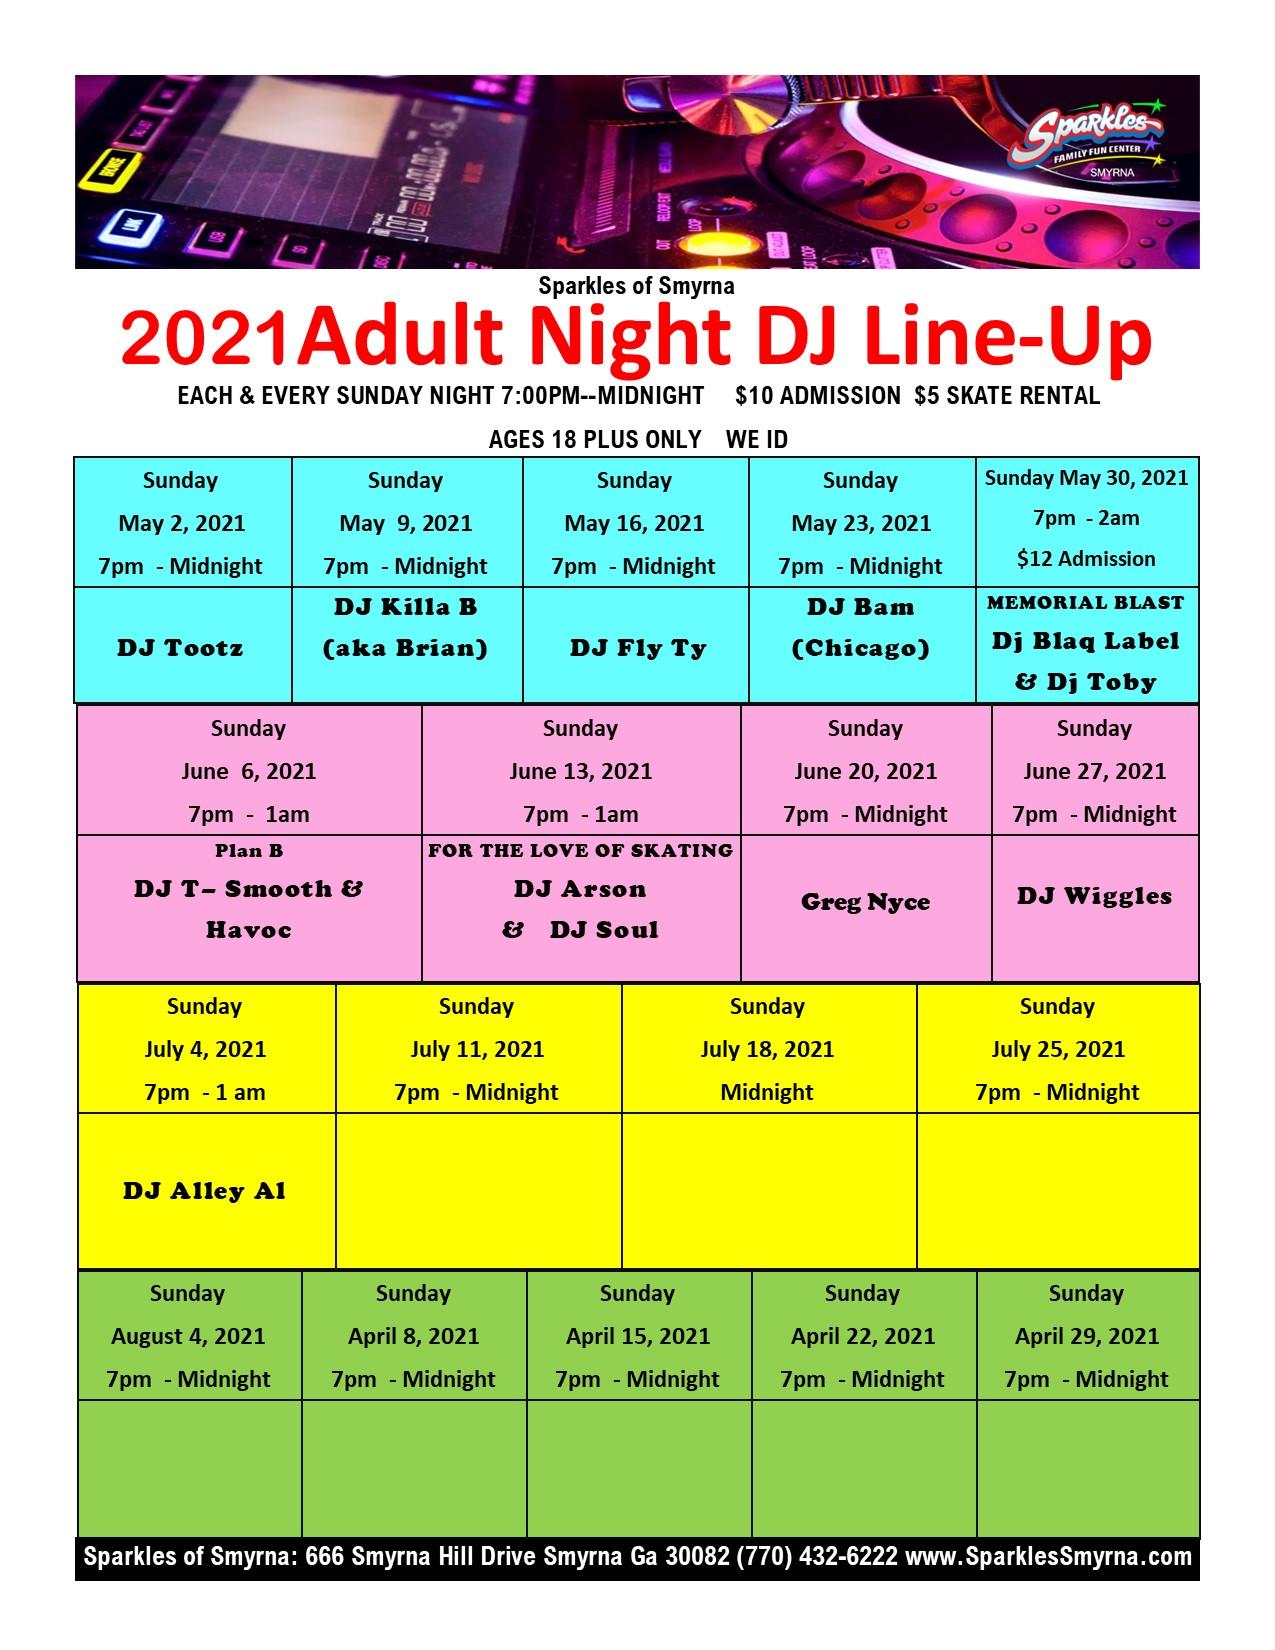 2021 Adult Night Dj Line-Up